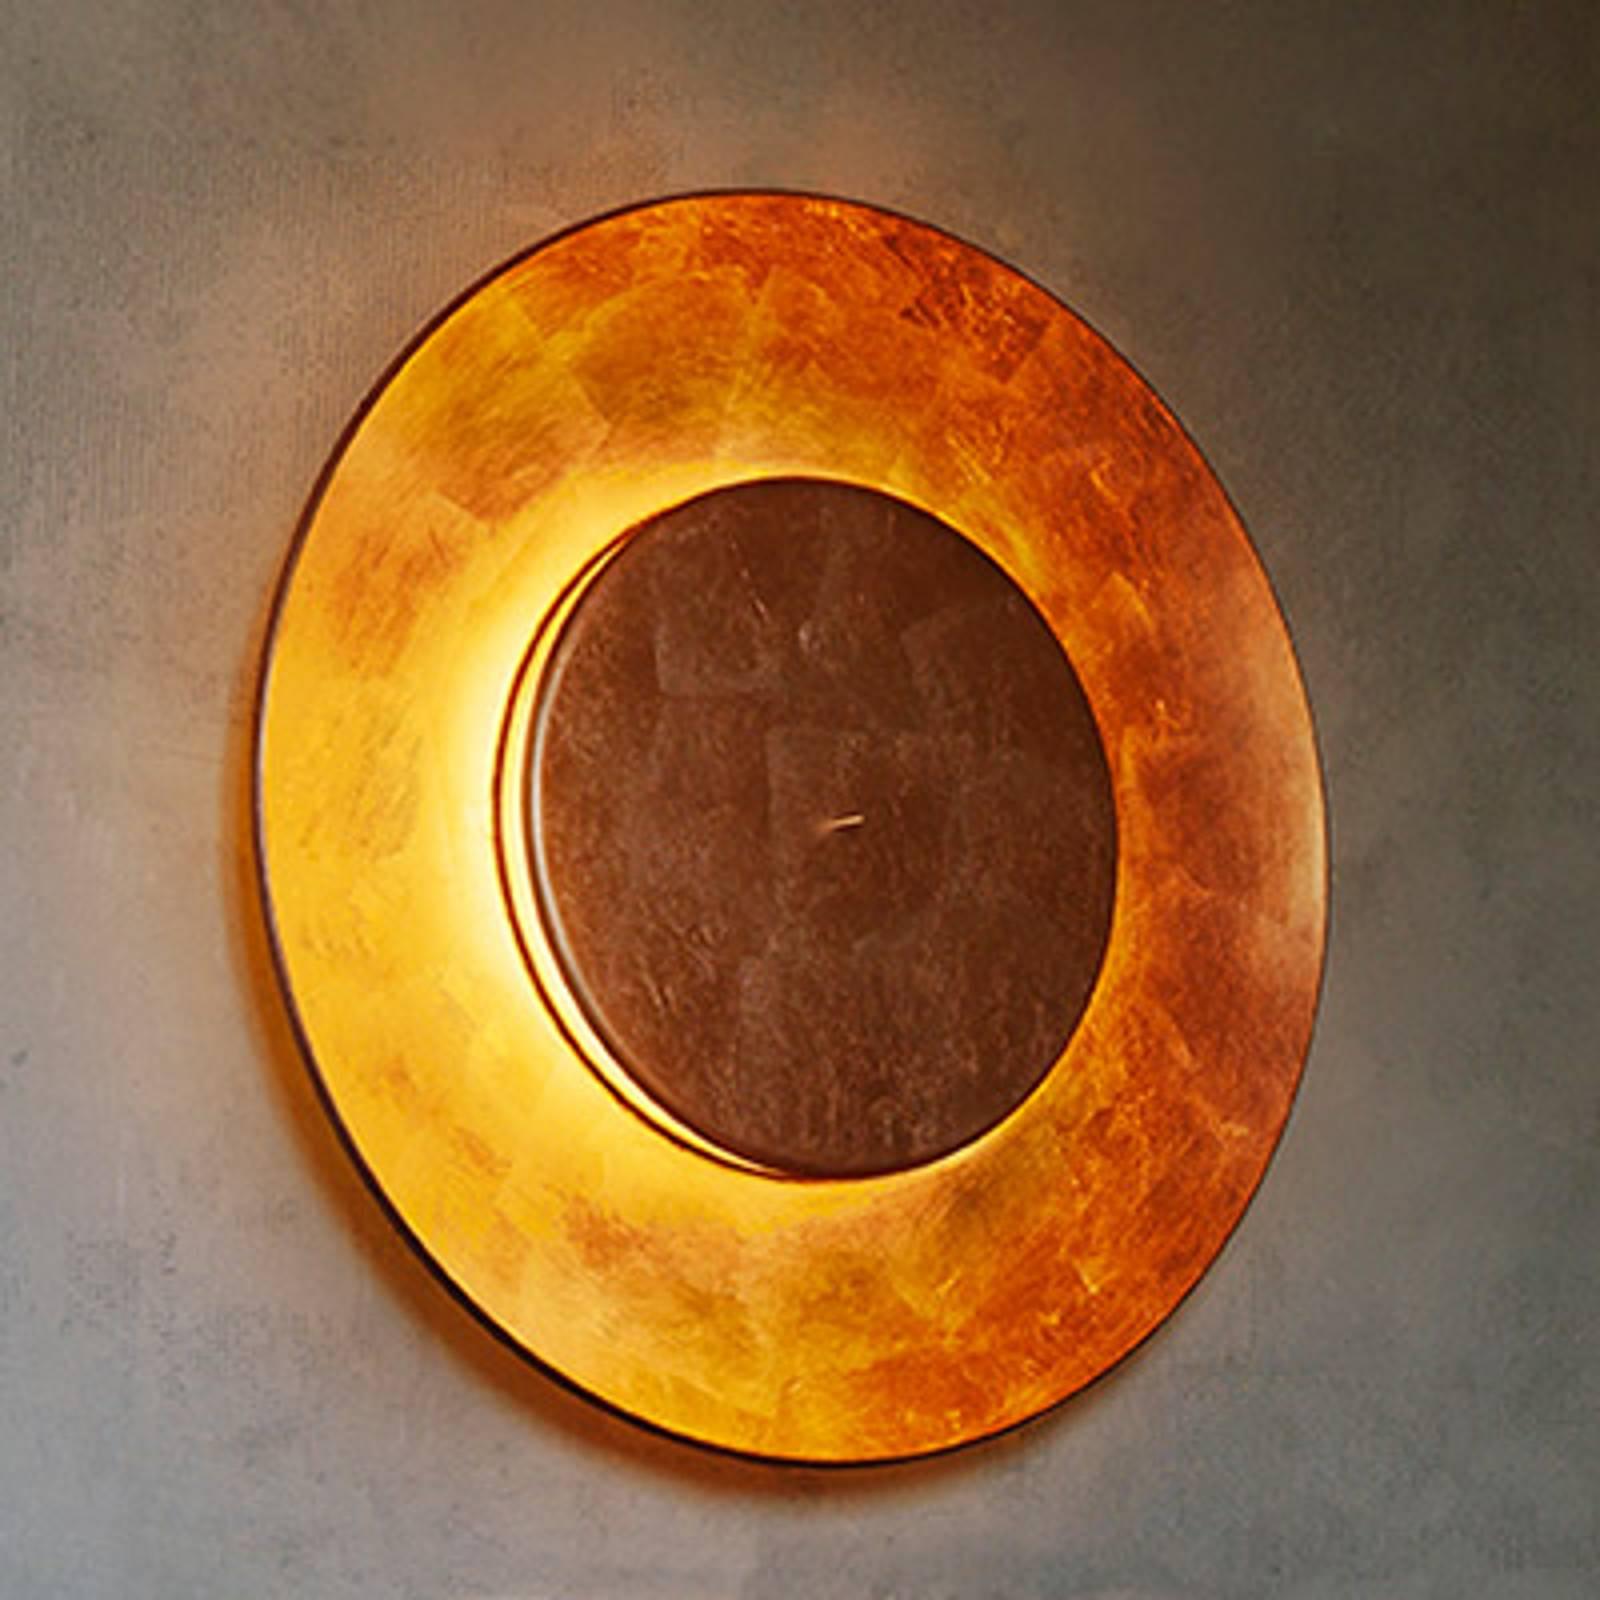 Bladkoperen wandlamp Lunaire 75 cm